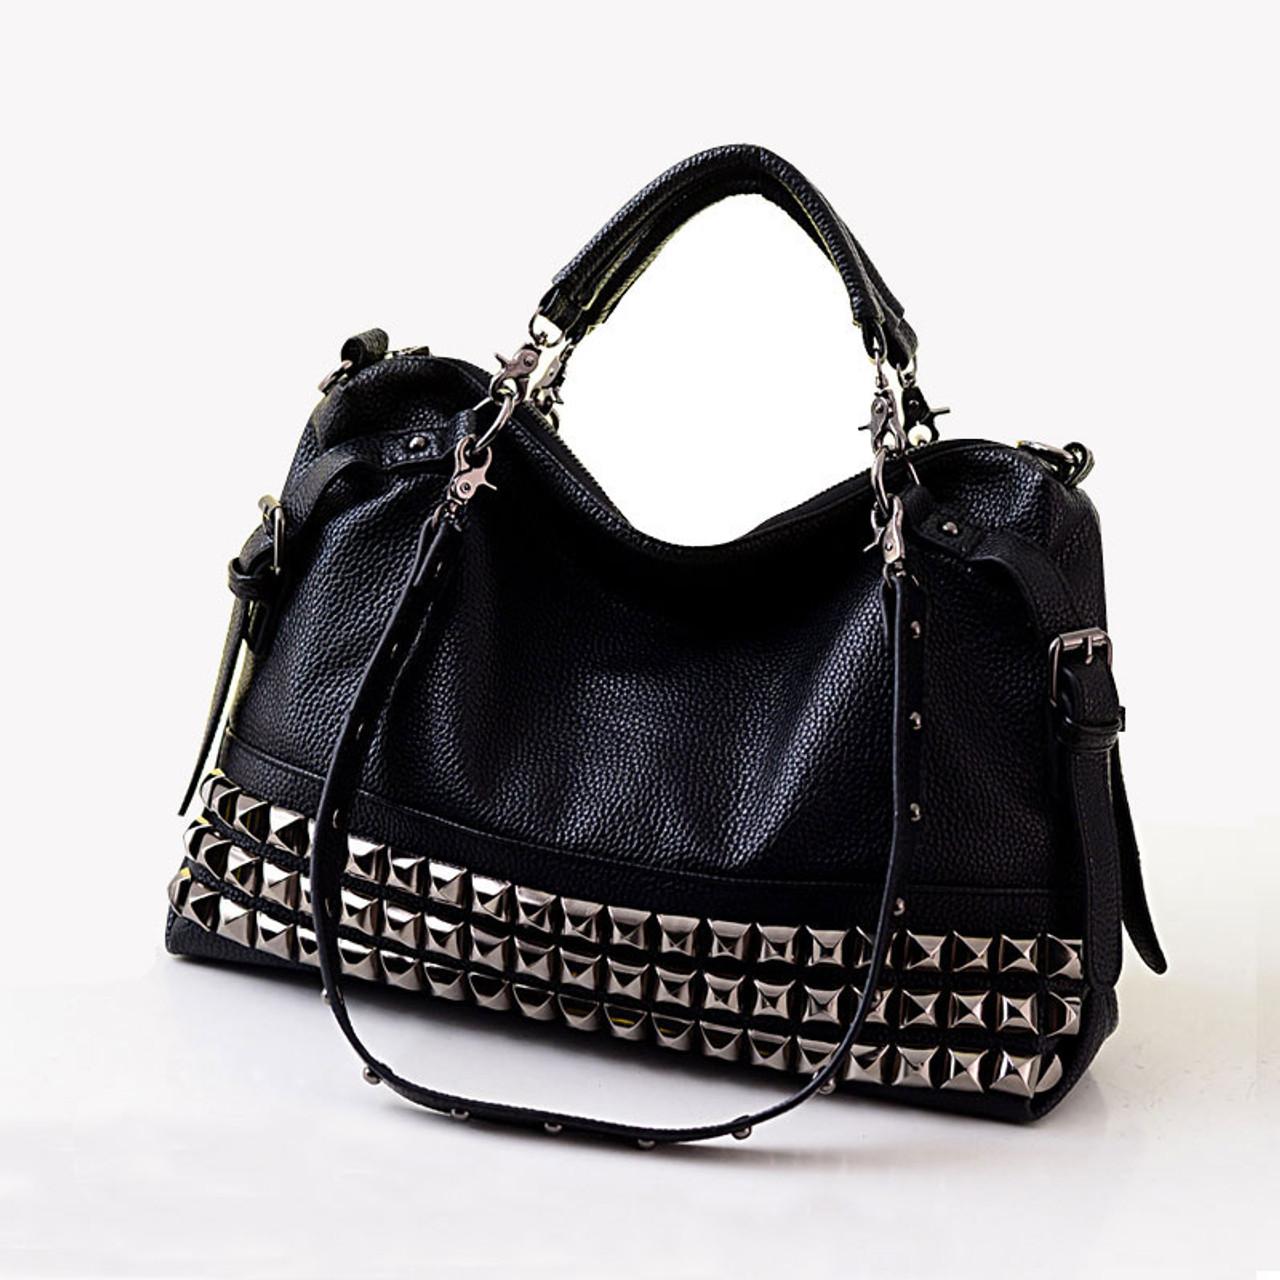 Rivet women s genuine leather fashion handbag motorcycle bag rivet  all-match handbag one shoulder cross-body big bag A4 - OnshopDeals.Com 8023f1074edea